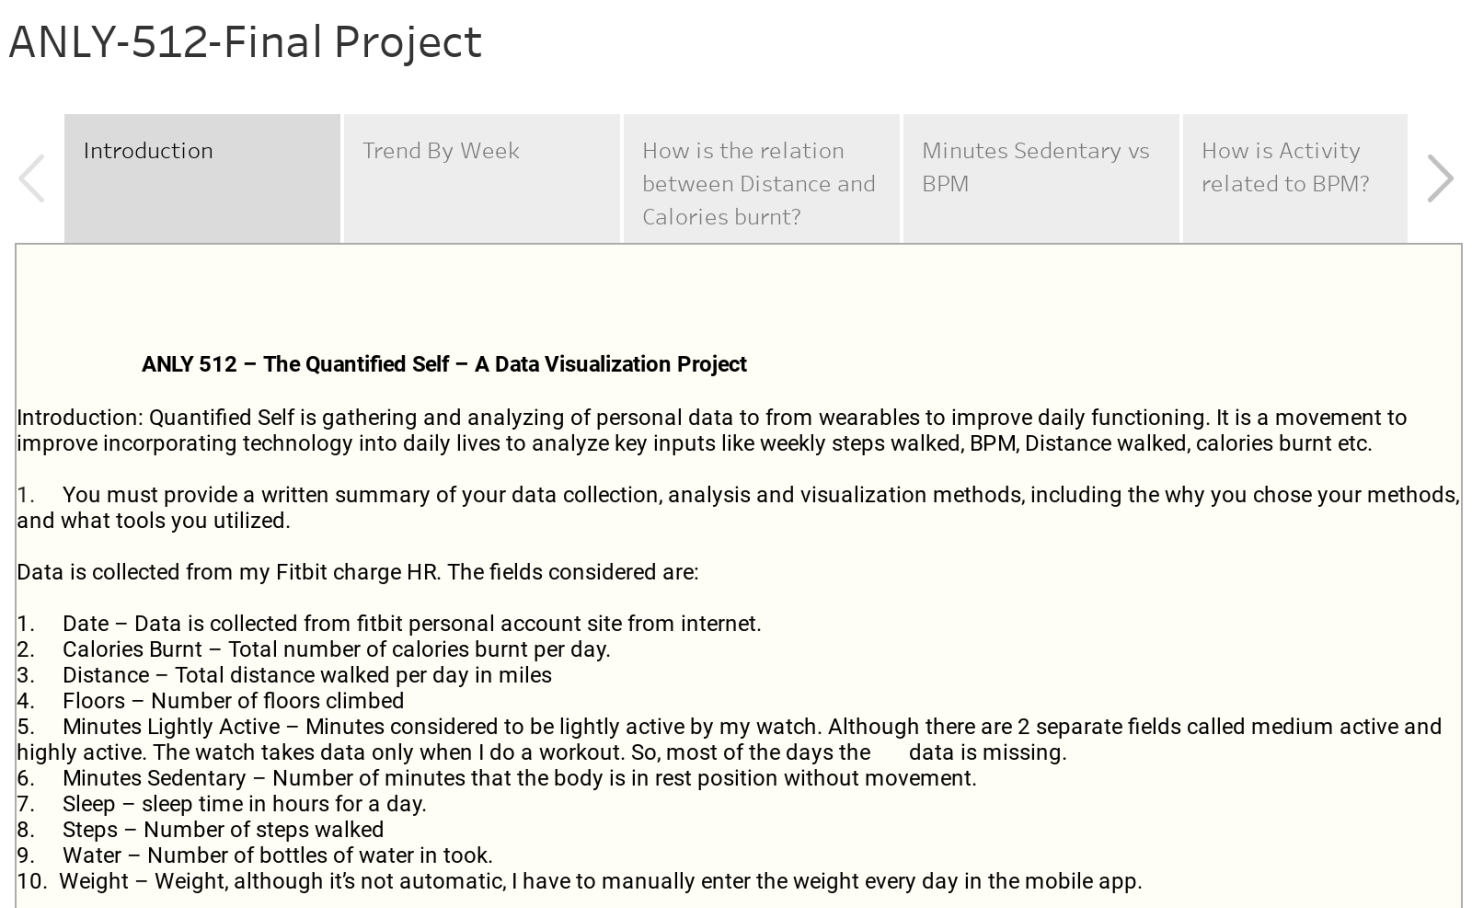 ANLY 512 Final Project - The Quantified Self - Venkata Kumar